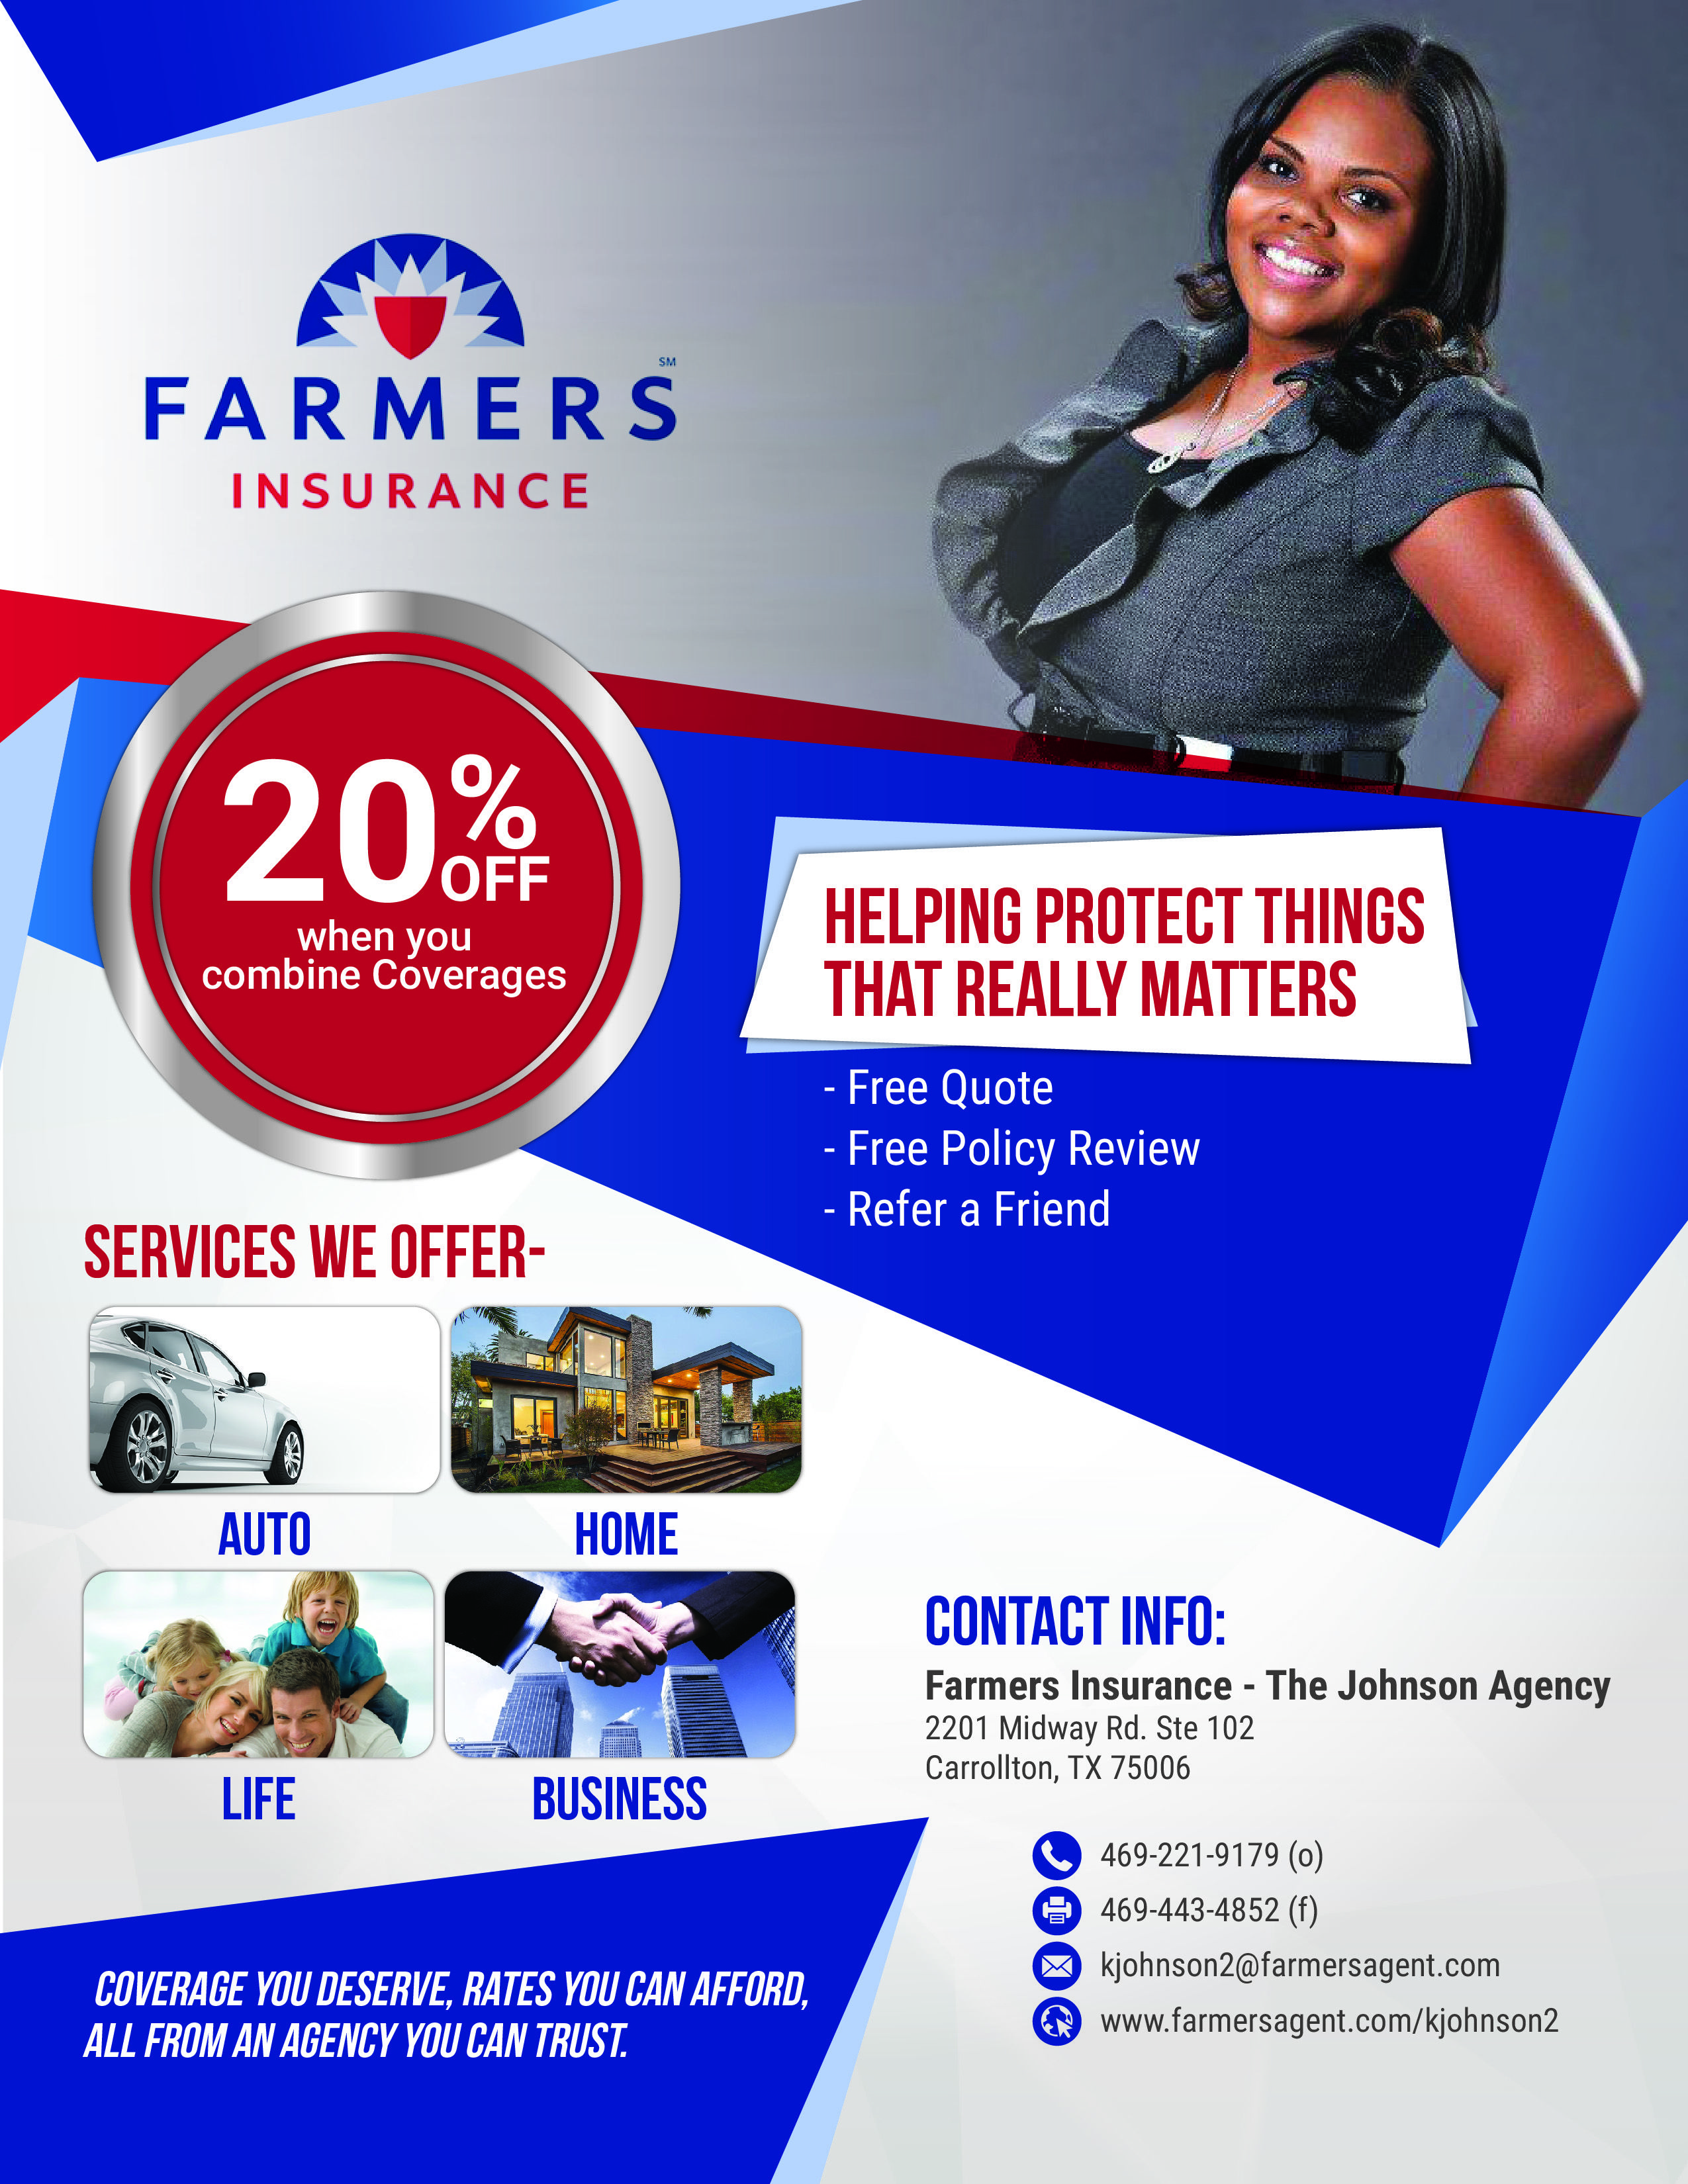 Farmers Insurance The Johnson Agency. Life Insurance